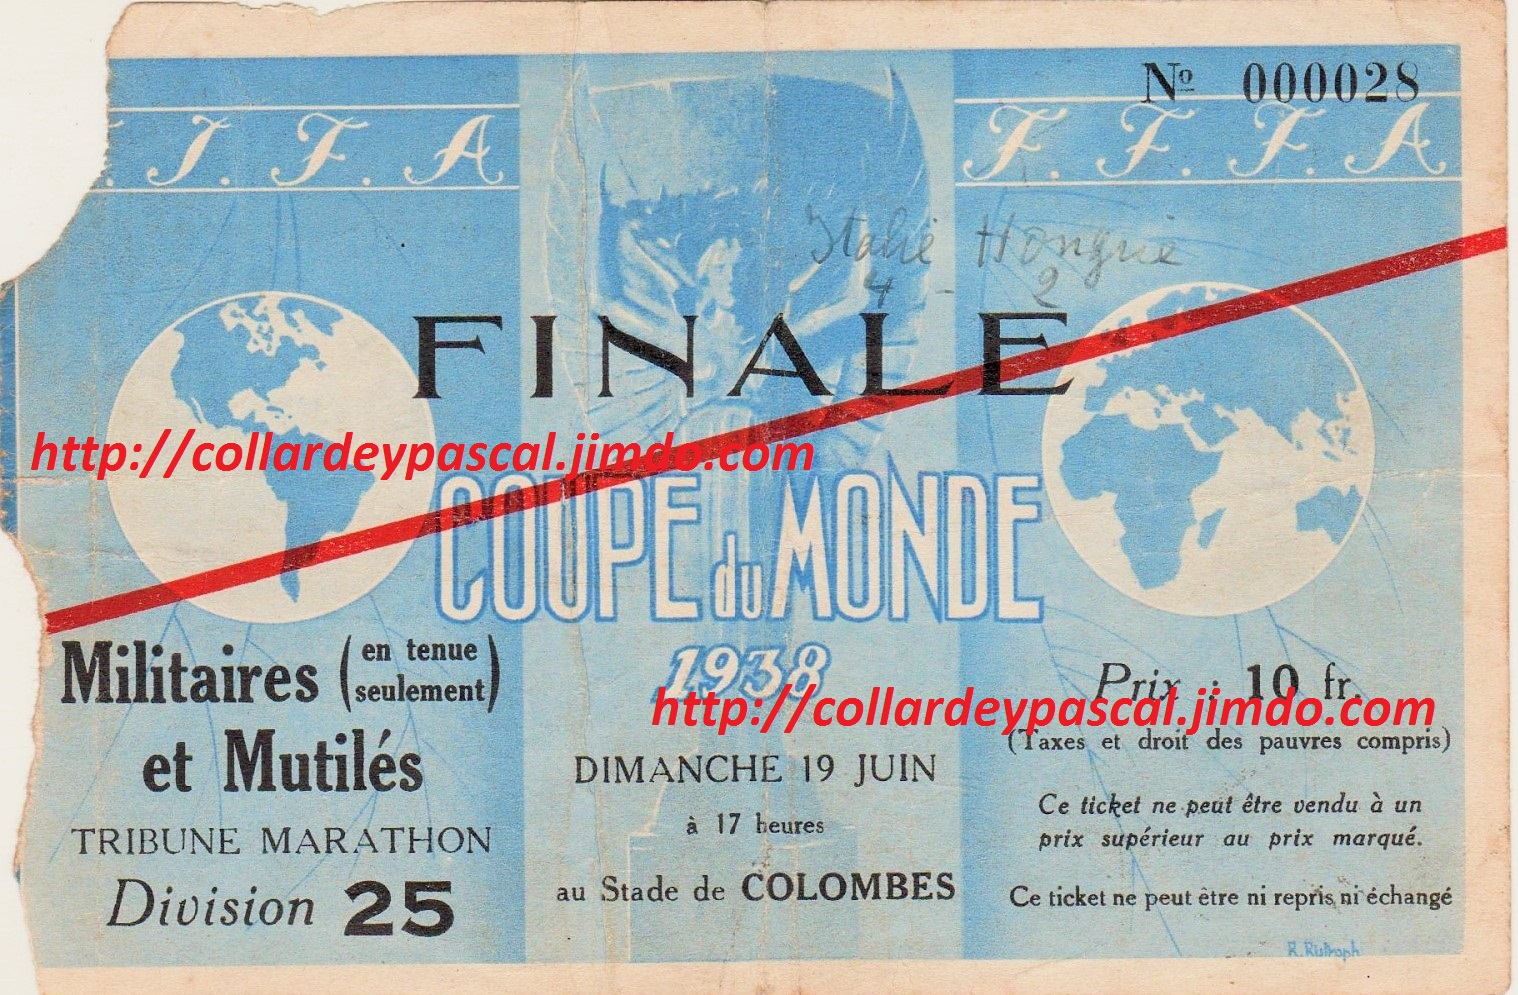 Italie - Hongrie Finale (France 1938)